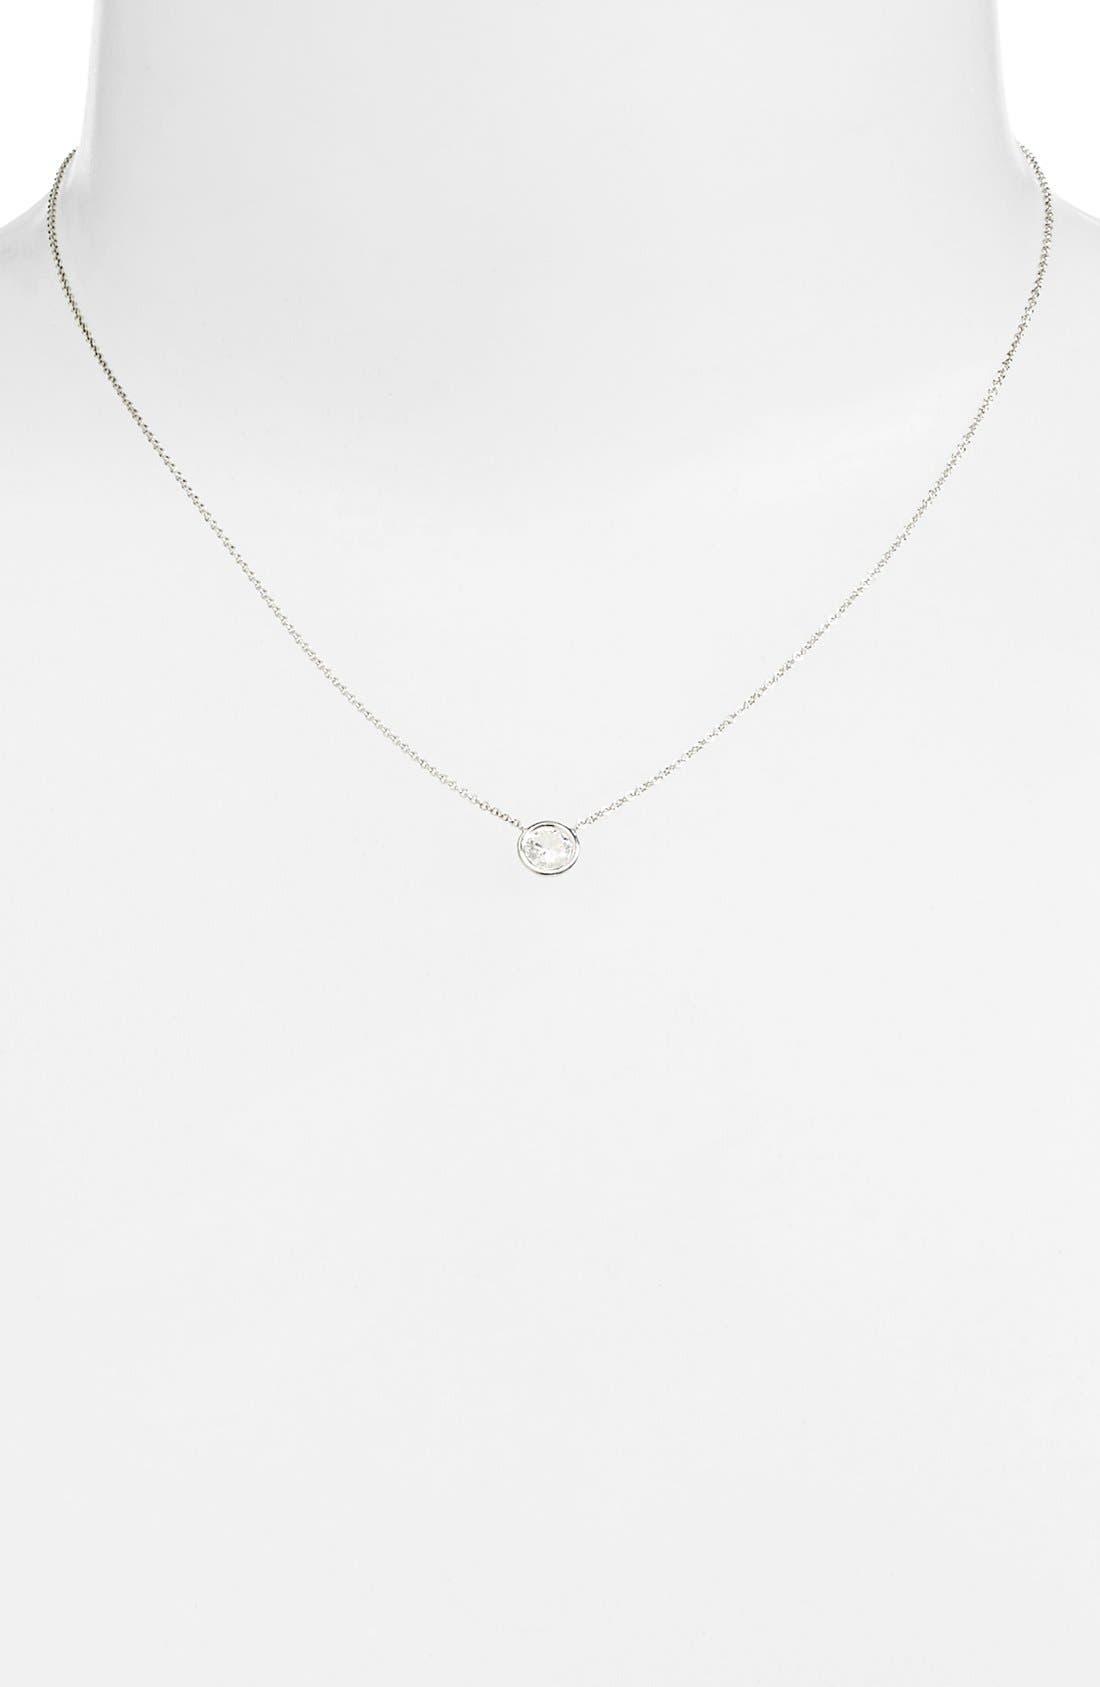 Large Diamond Solitaire Pendant Necklace,                             Alternate thumbnail 2, color,                             White Gold